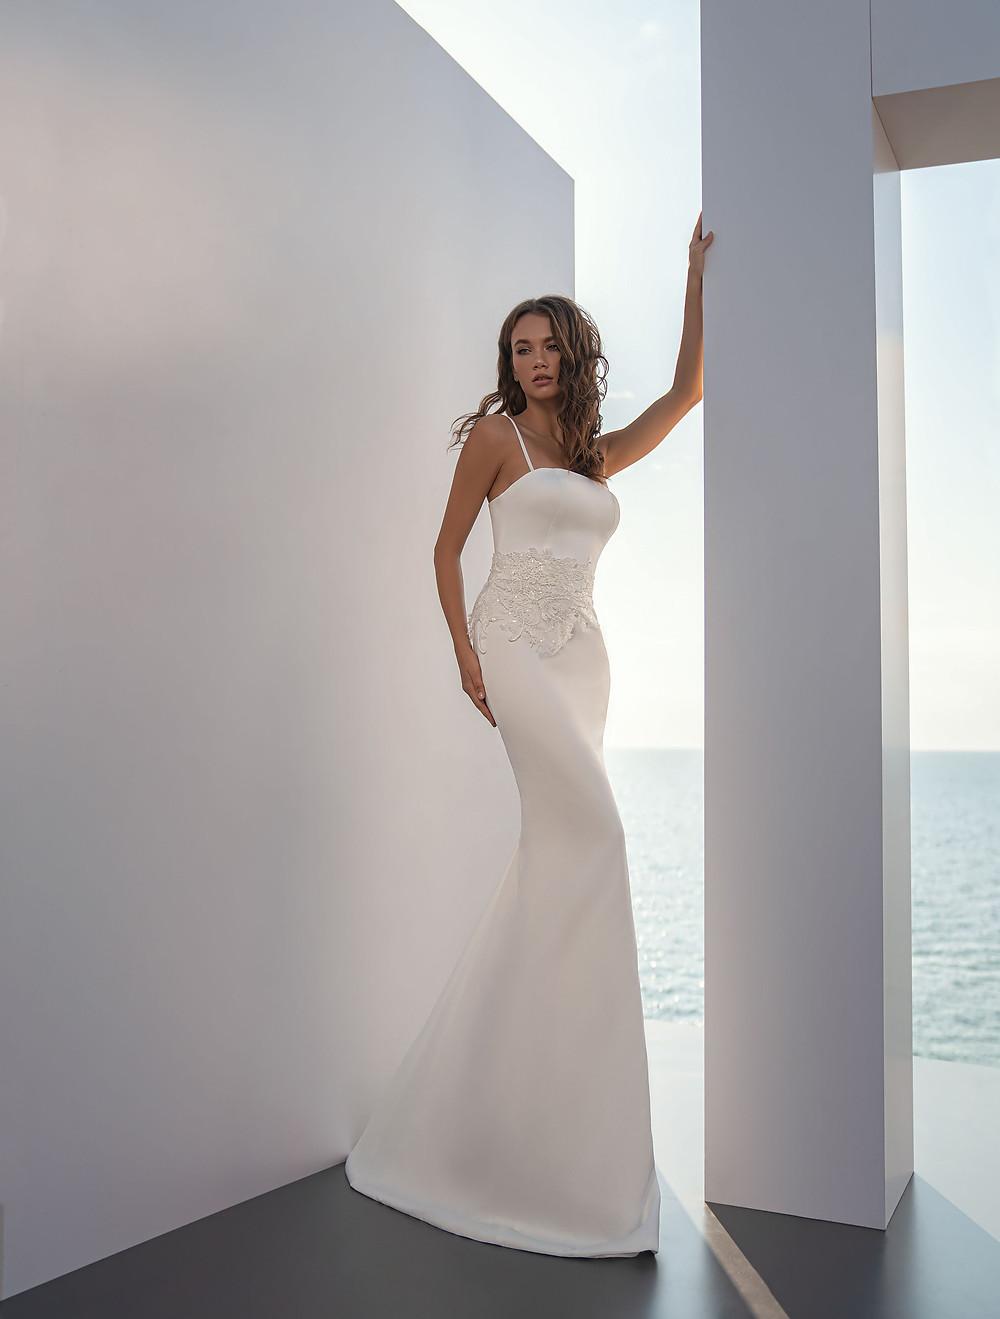 rochii de mireasa, rochii de mireasa sirena, rochii de mireasa lux, rochii de mireasa bucuresti